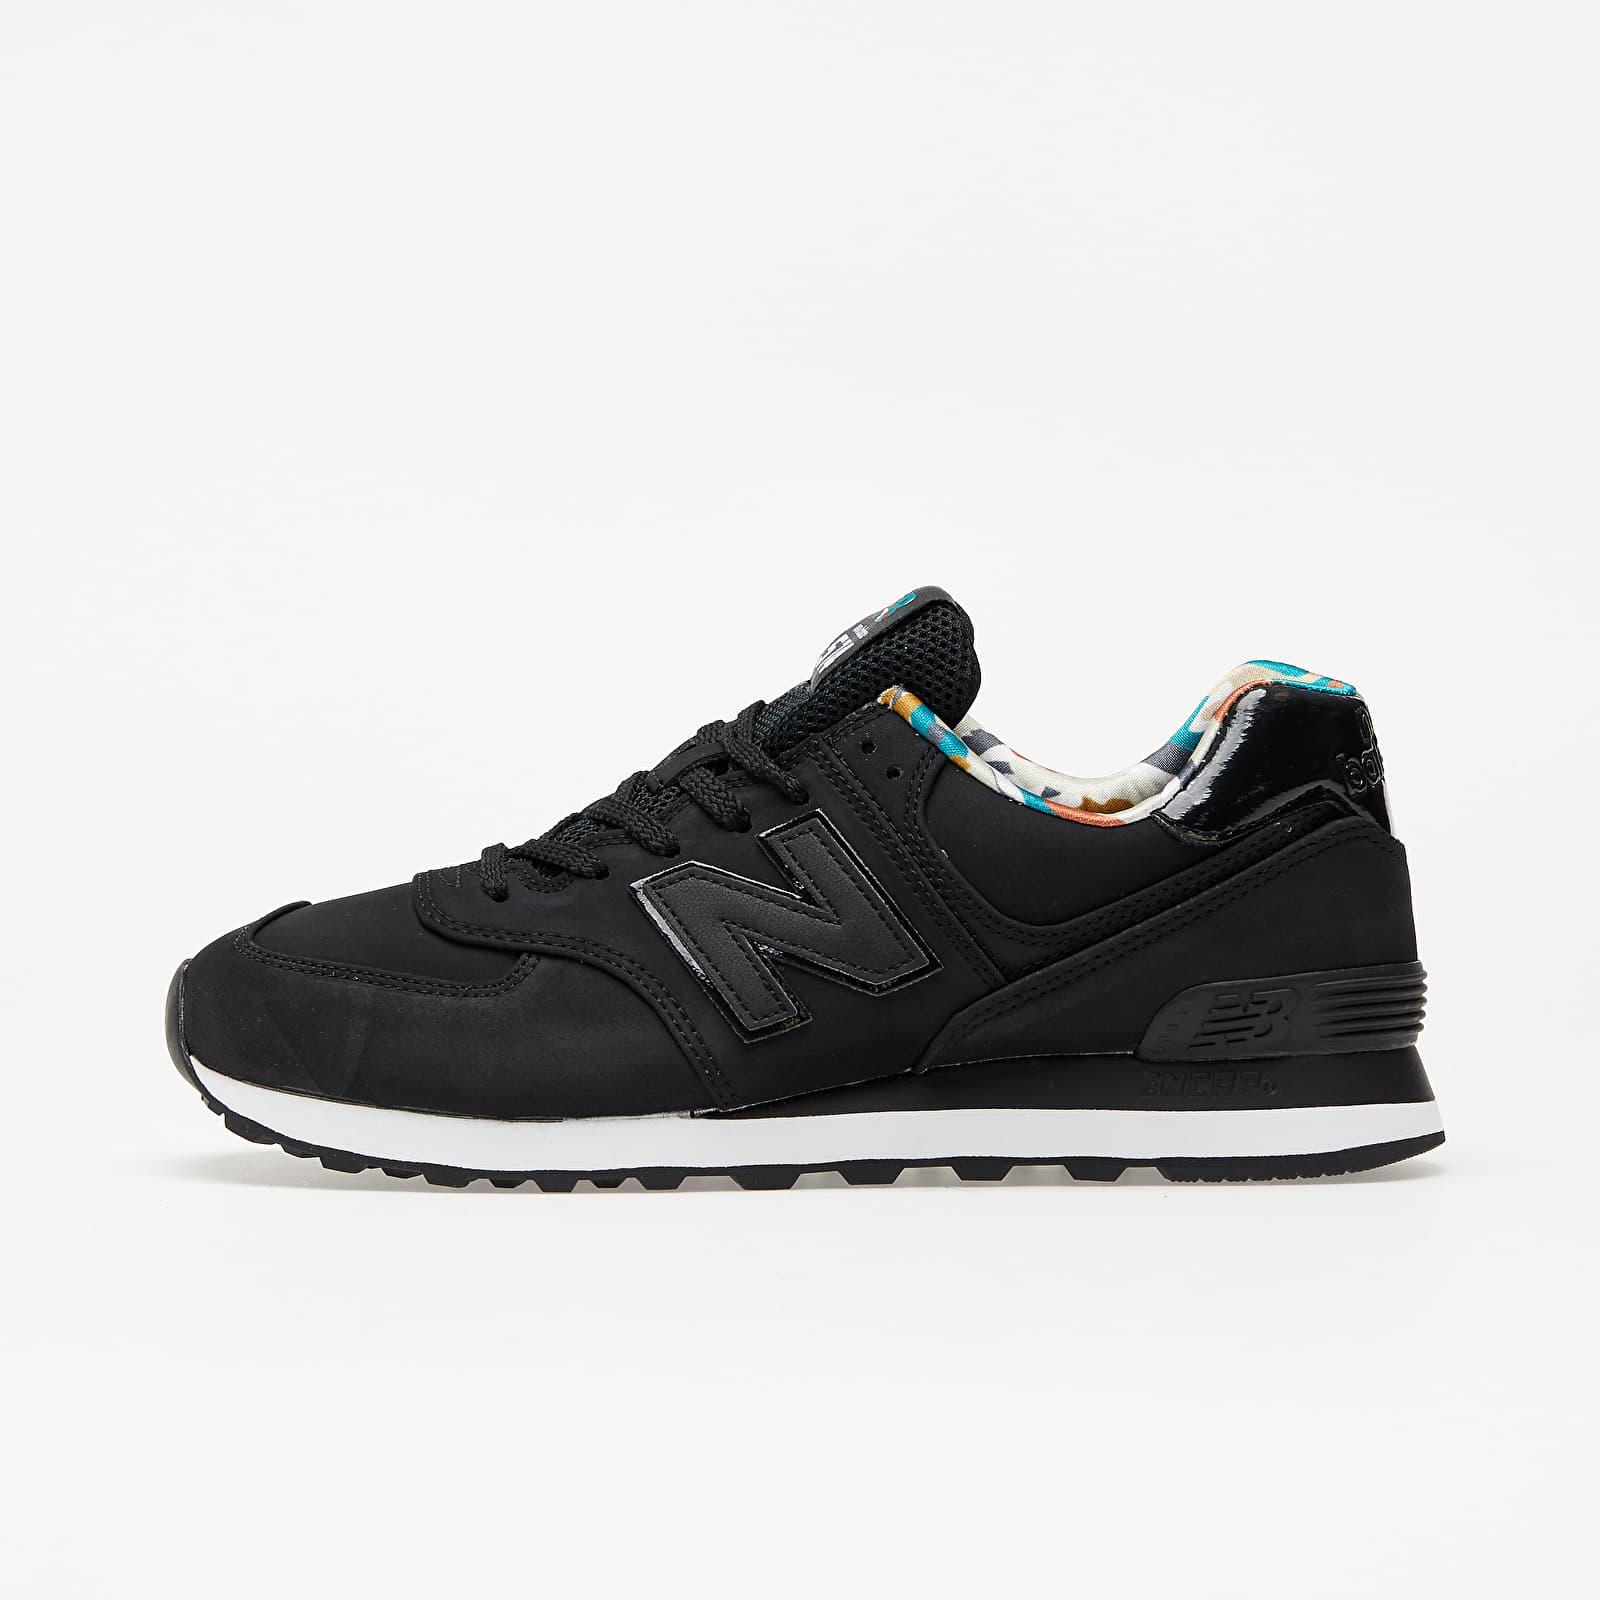 New Balance 574 Black ML574GYH